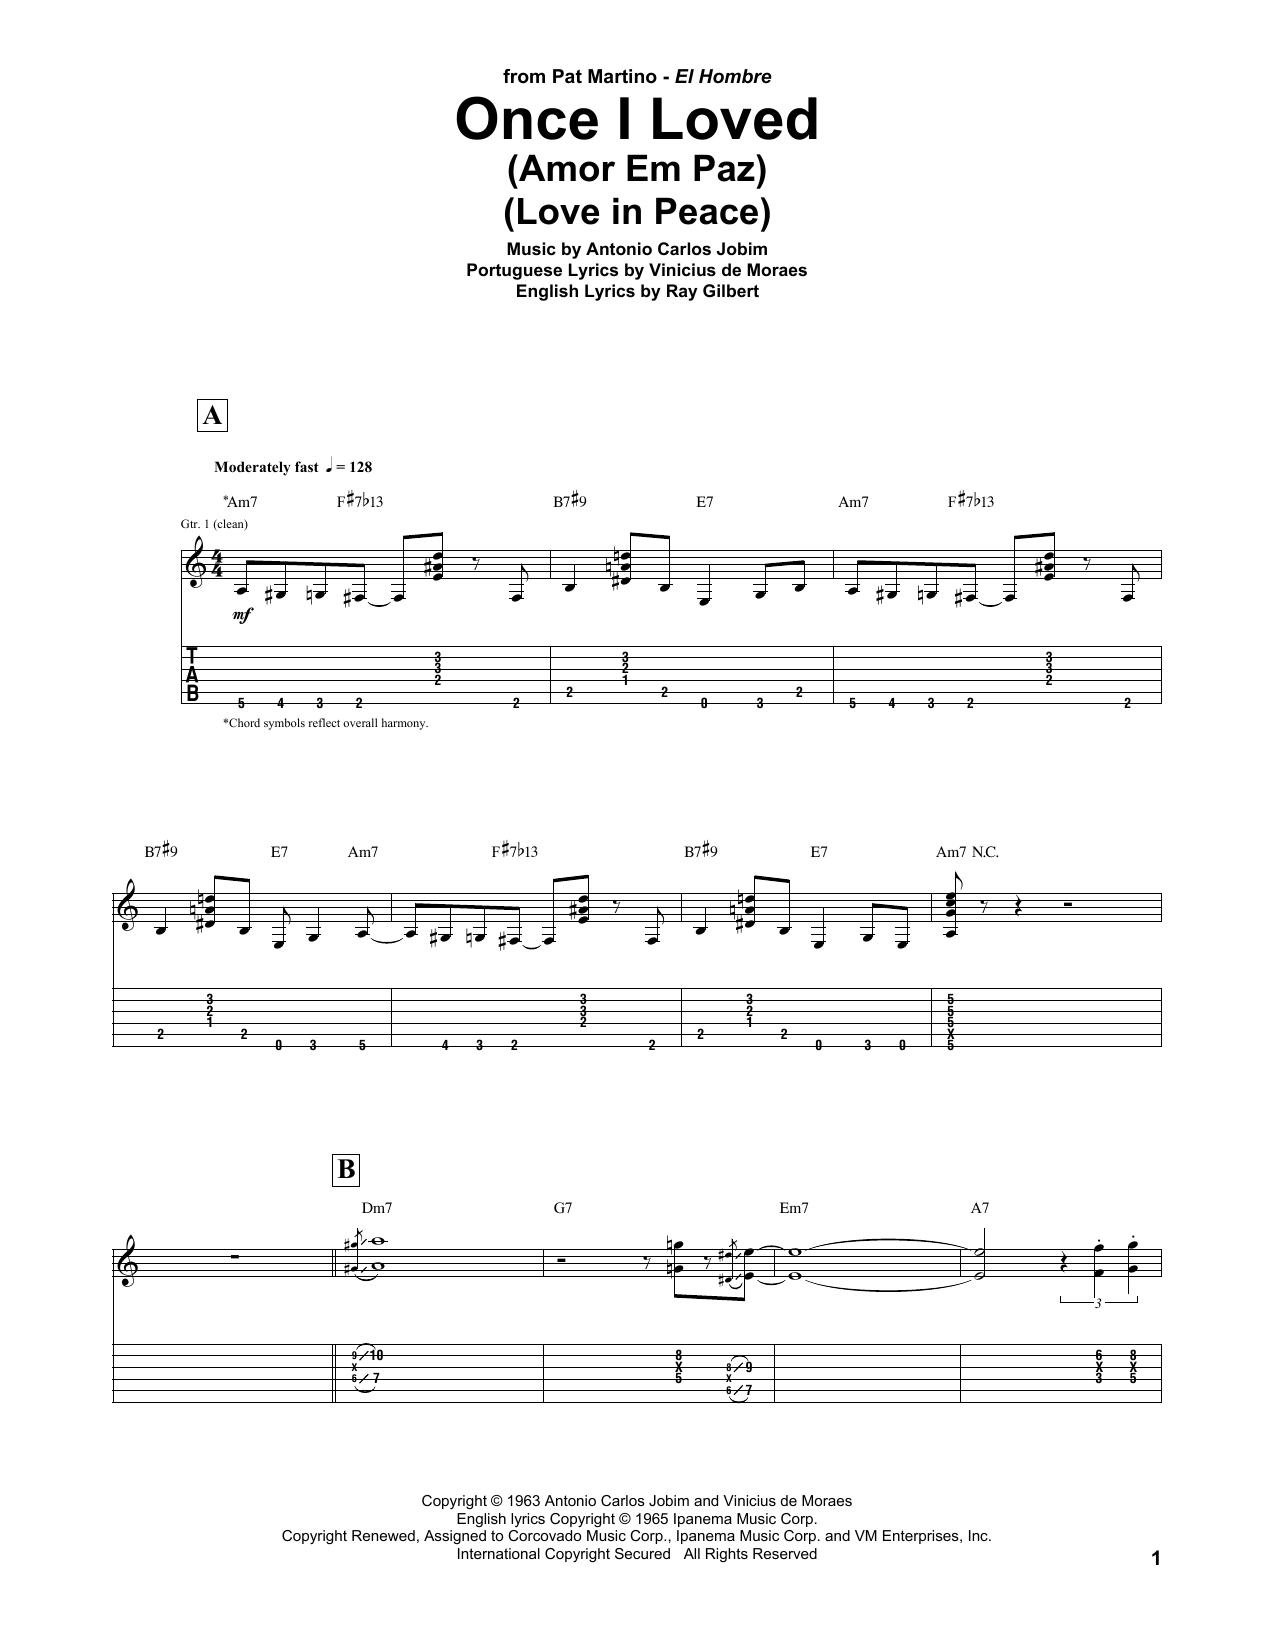 Once I Loved (Amor Em Paz) (Love In Peace) Sheet Music